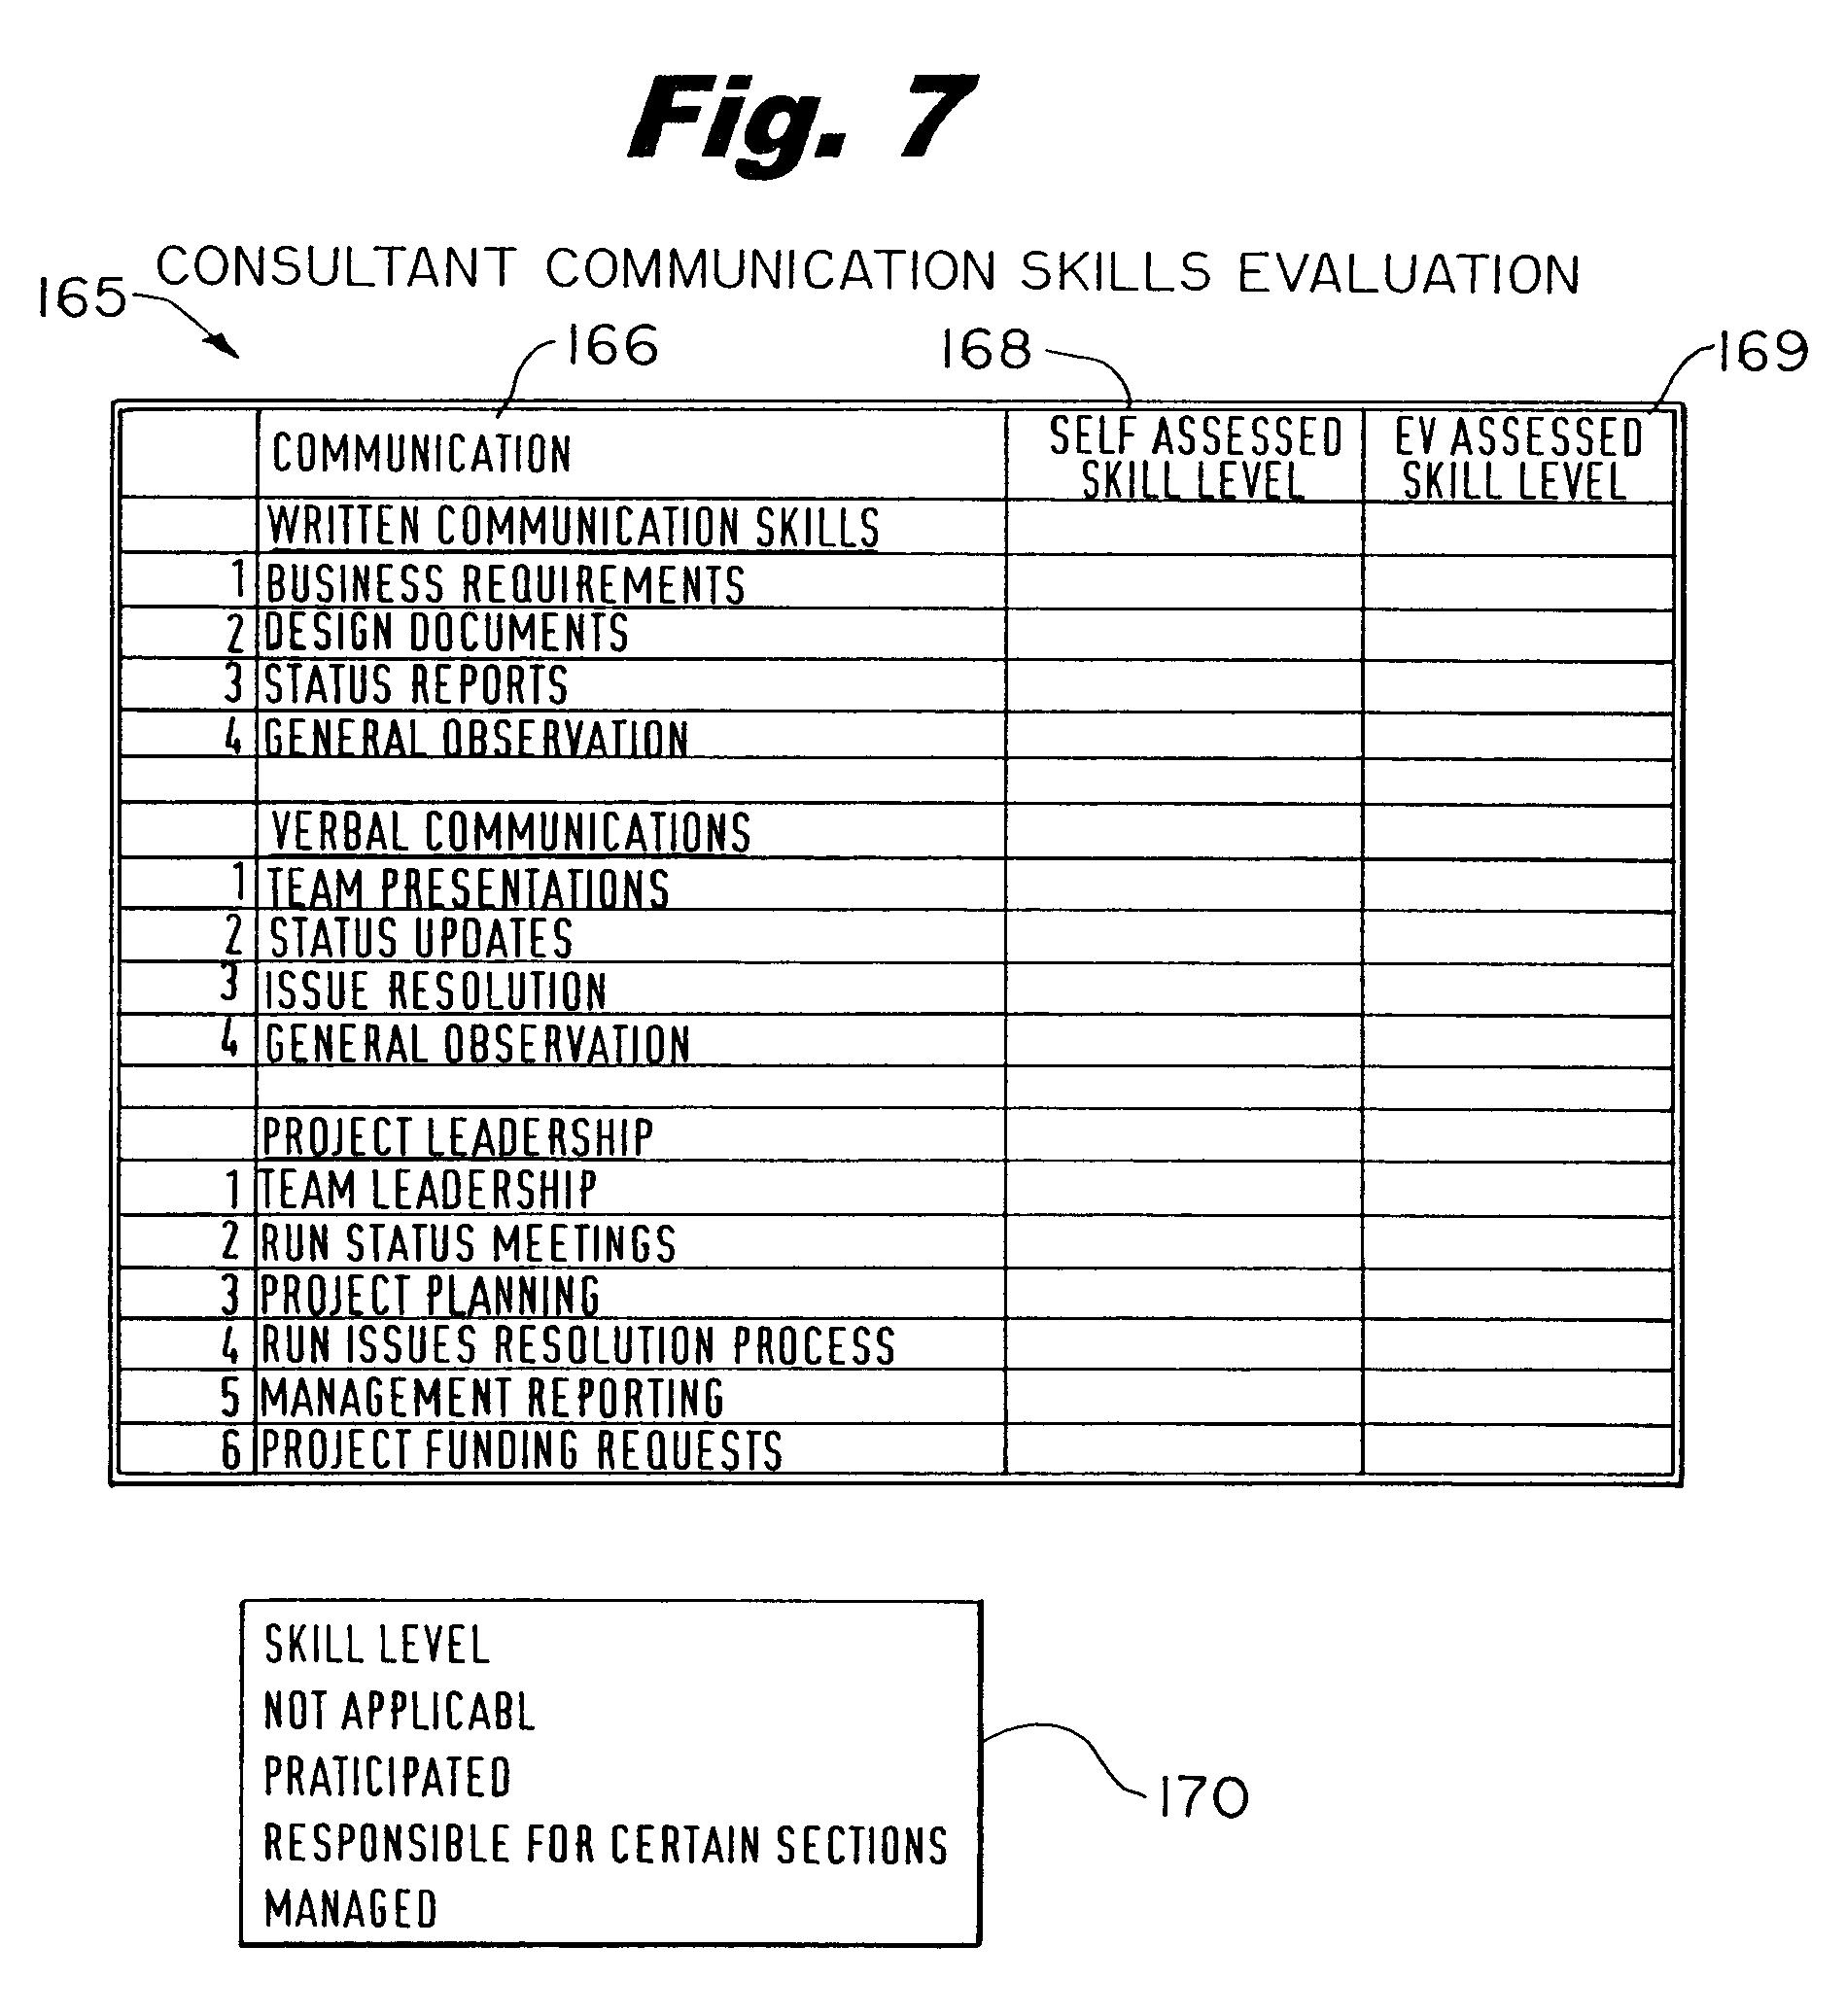 Patent US 6,289,340 B1